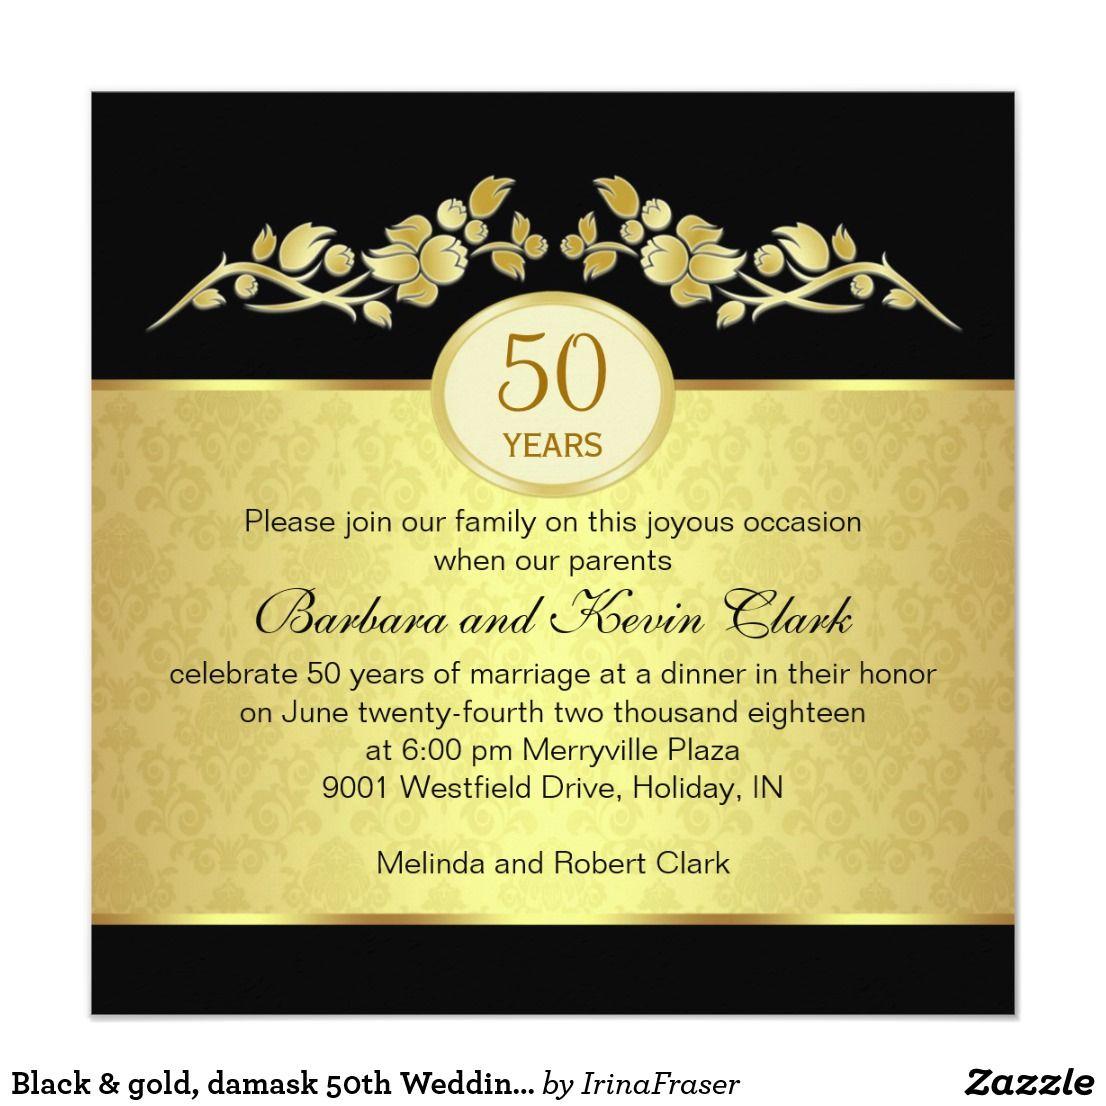 Black & gold, damask 50th Wedding Anniversary Invitation